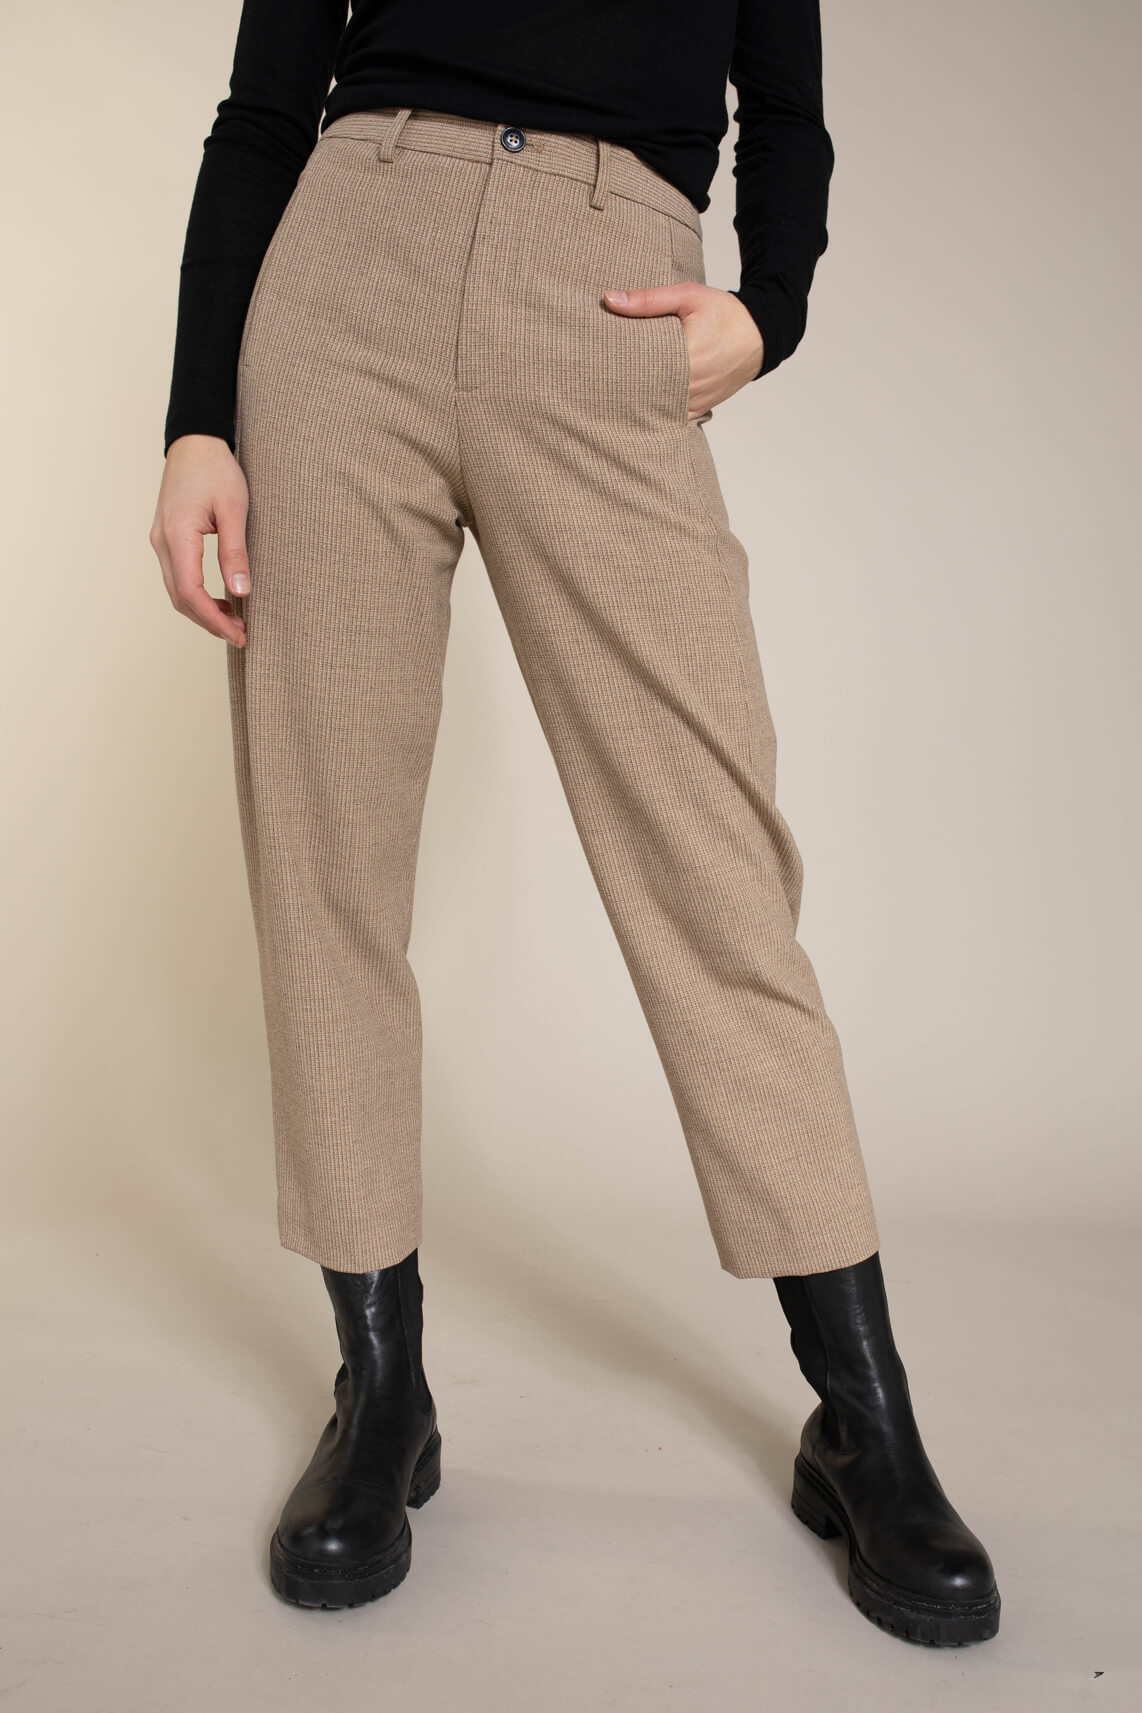 Closed Dames rechte pantalon Bruin